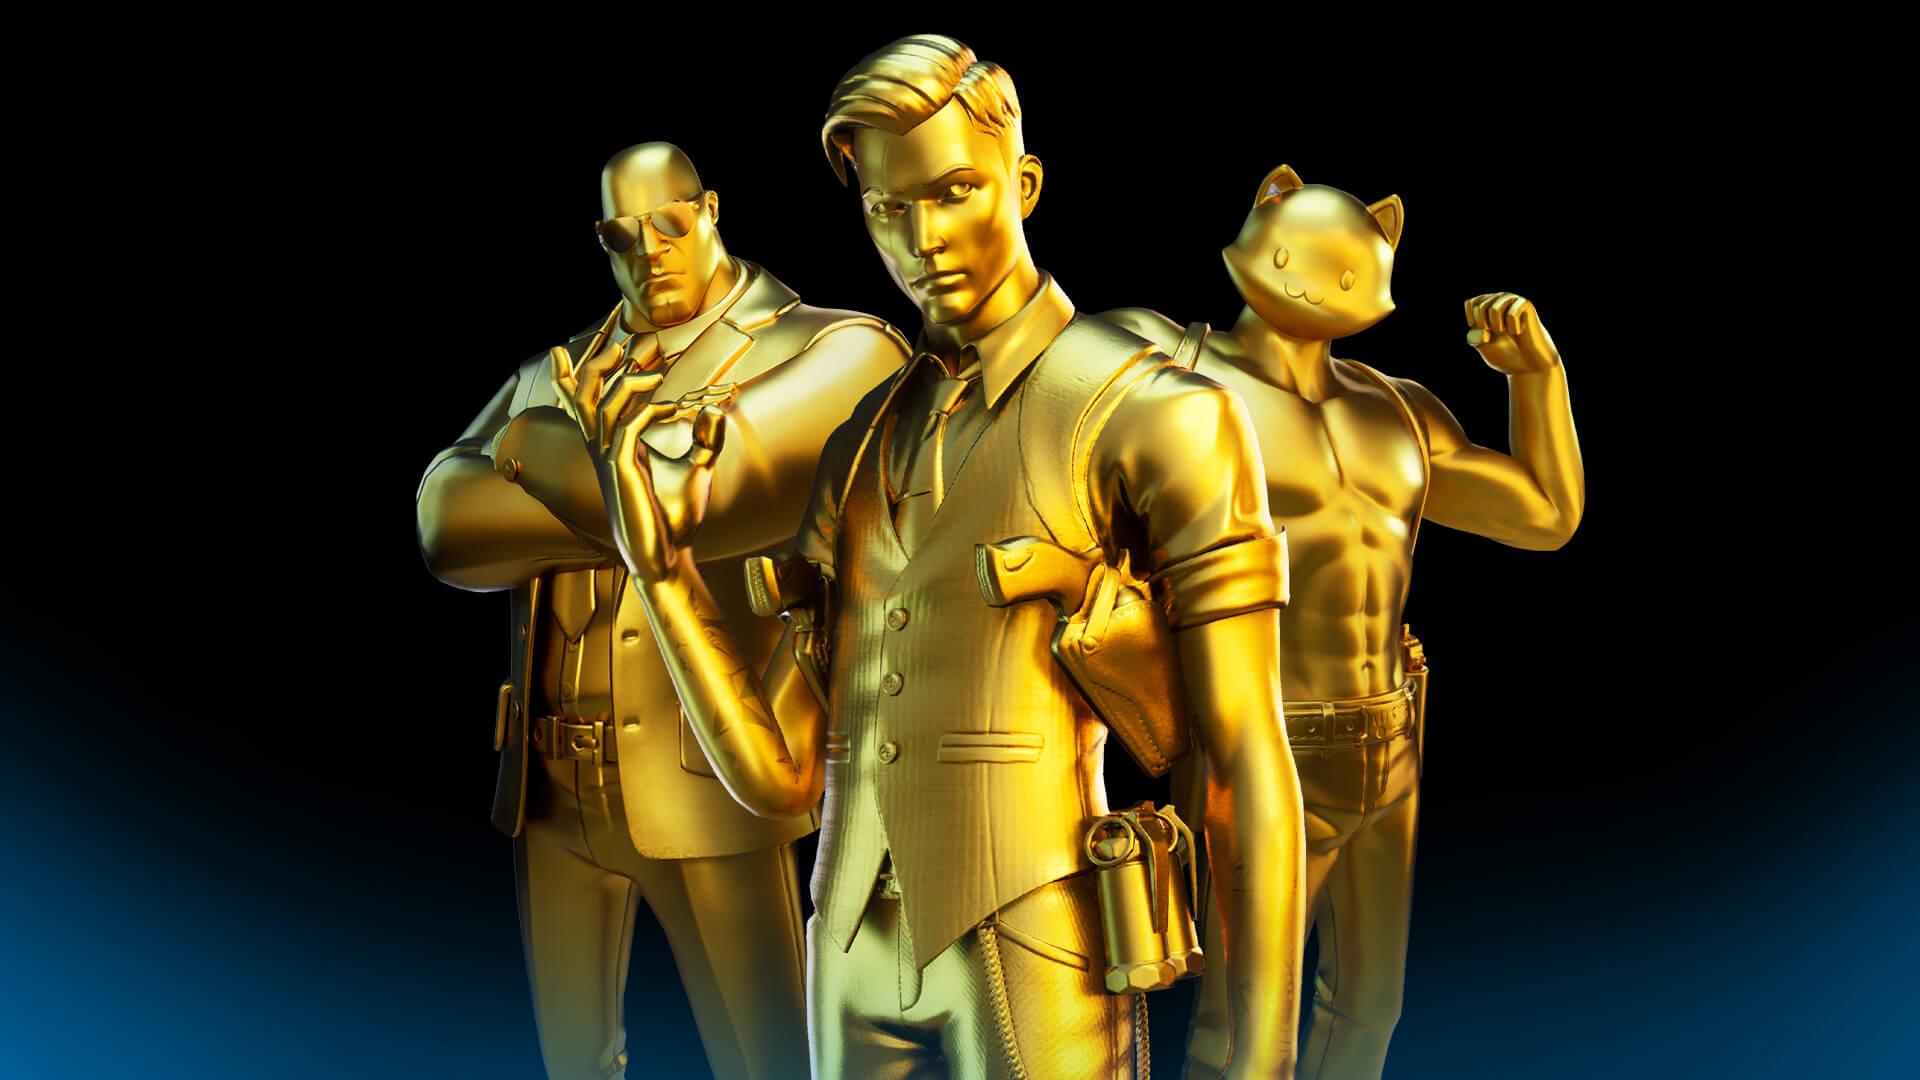 fortnite-gold-skins